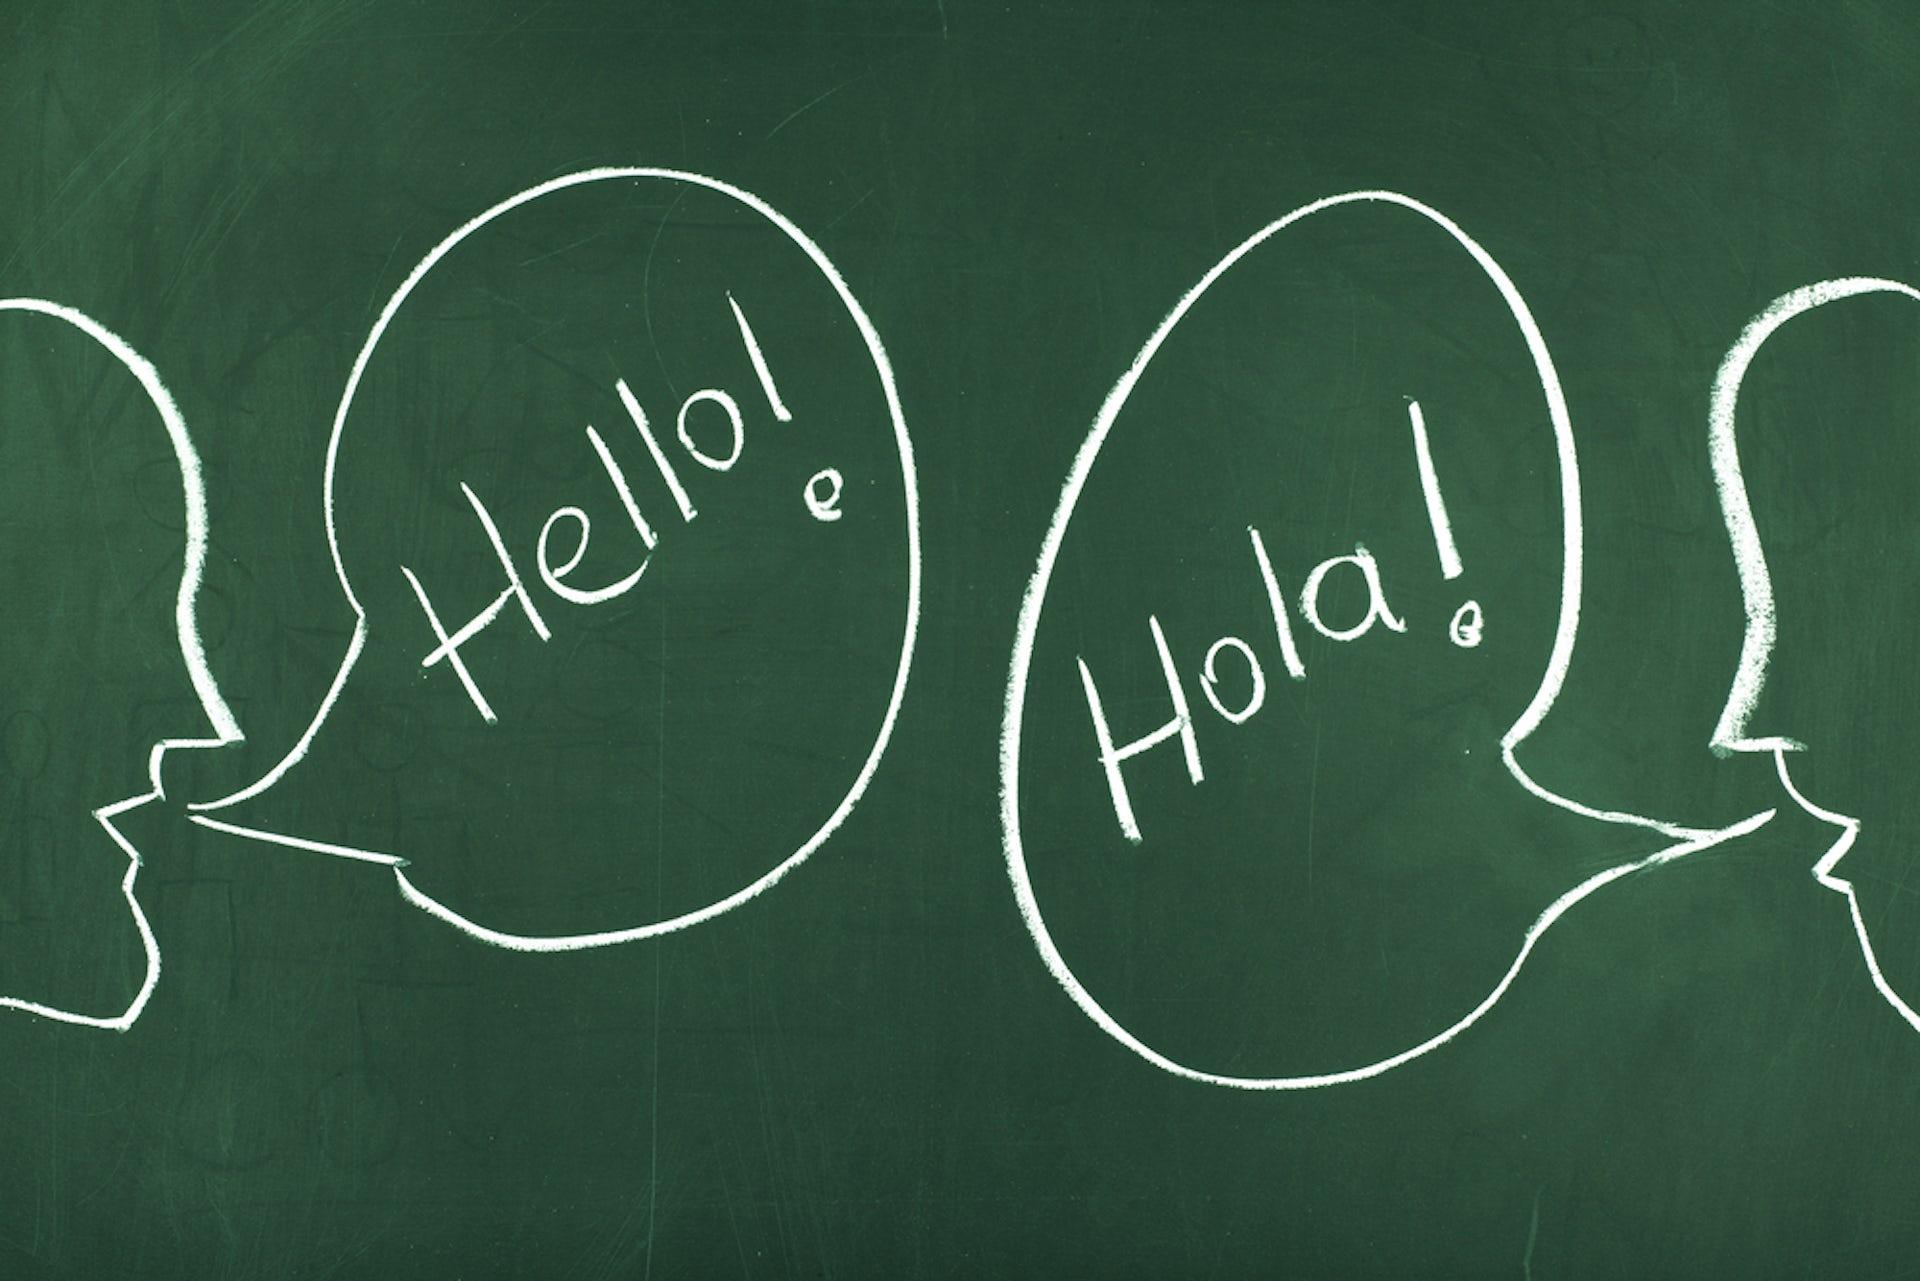 Bilingual  >> How To Make Australia More Bilingual